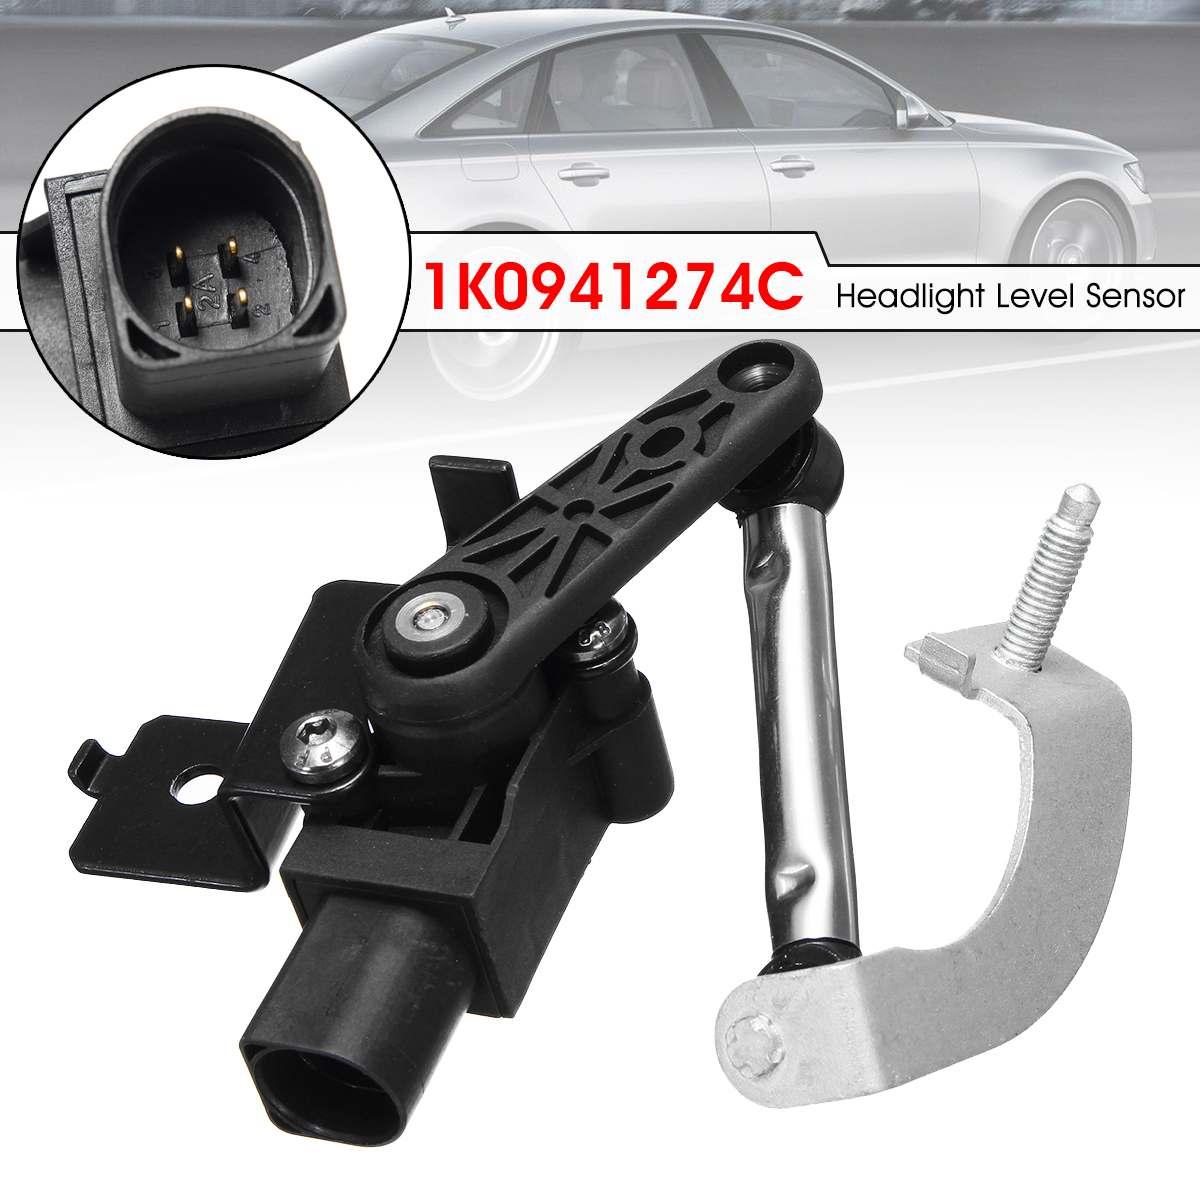 Car Headlight Level Sensor 1K0941274C For Audi A3 A6 For VW Caddy EOS Golf Touran Jetta